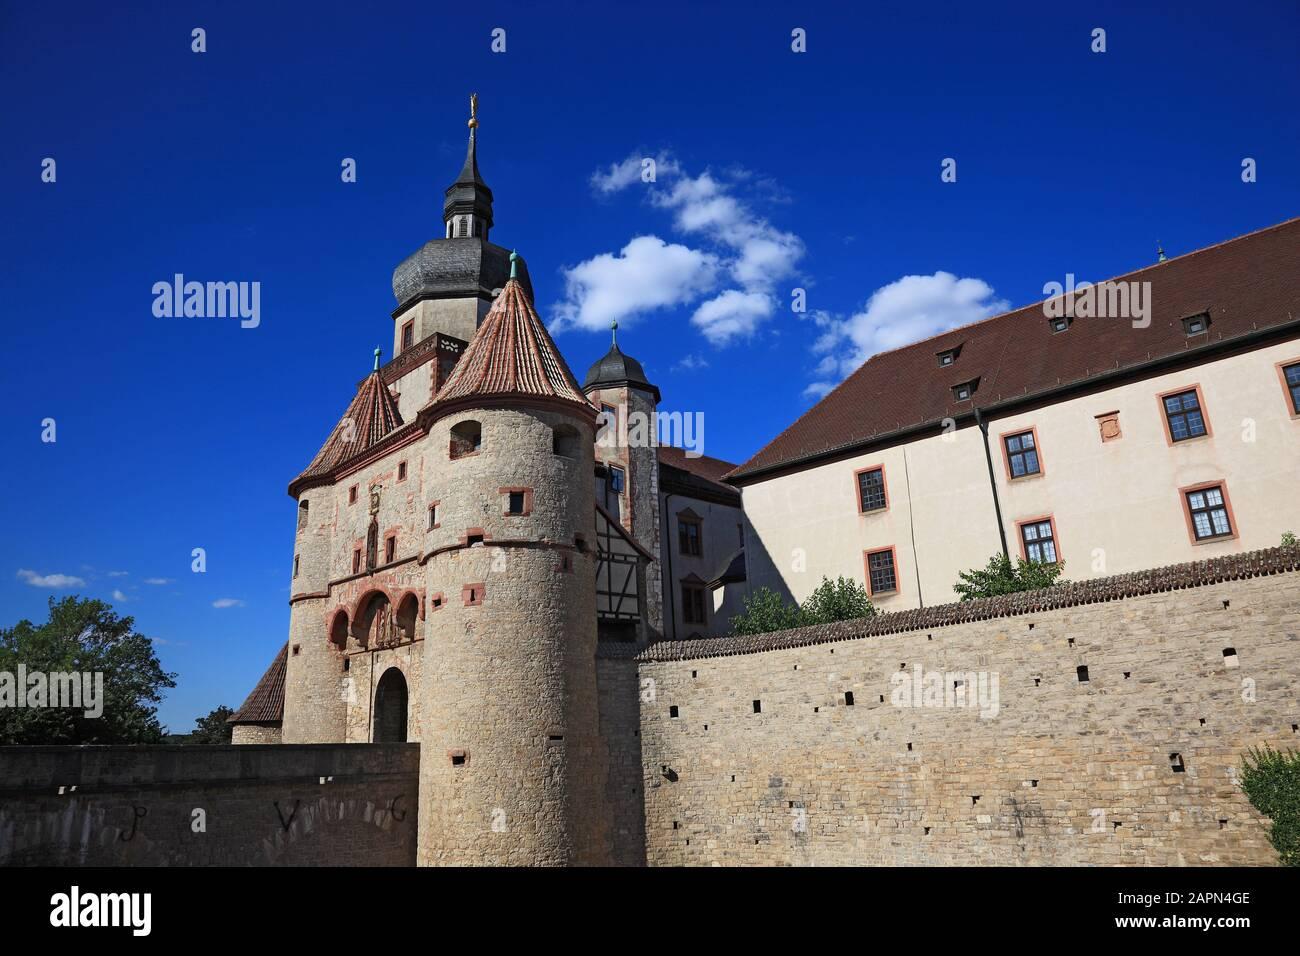 gate Scherenbergtor and tower Kiliansturm, fortress Marienberg, Würzburg, Wuerzburg, Lower Franconia , Bavaria, Germany Stock Photo